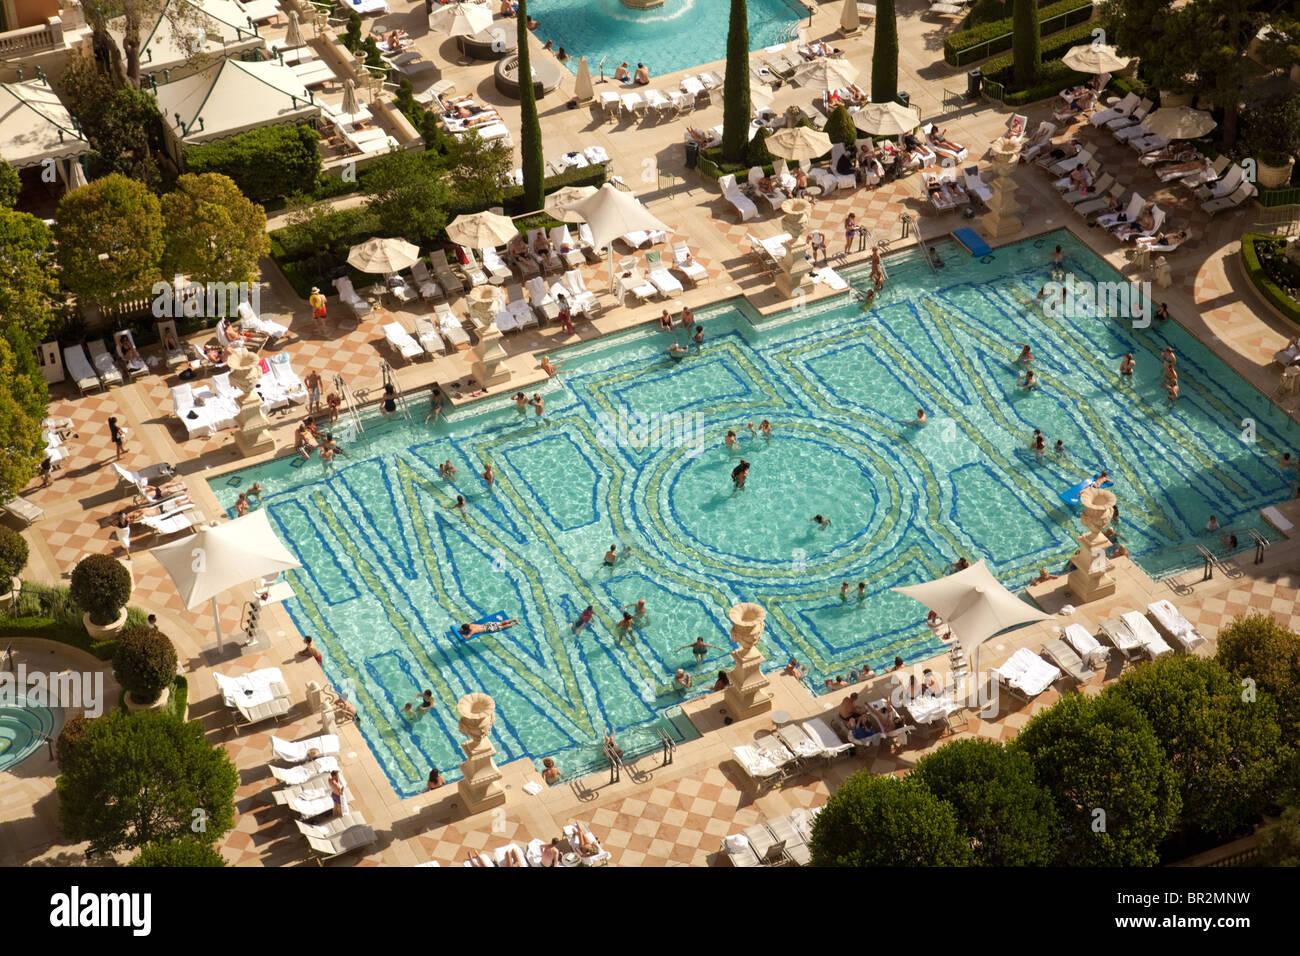 The Swimming Pools At The Bellagio Hotel Las Vegas Usa Stock Photo Alamy